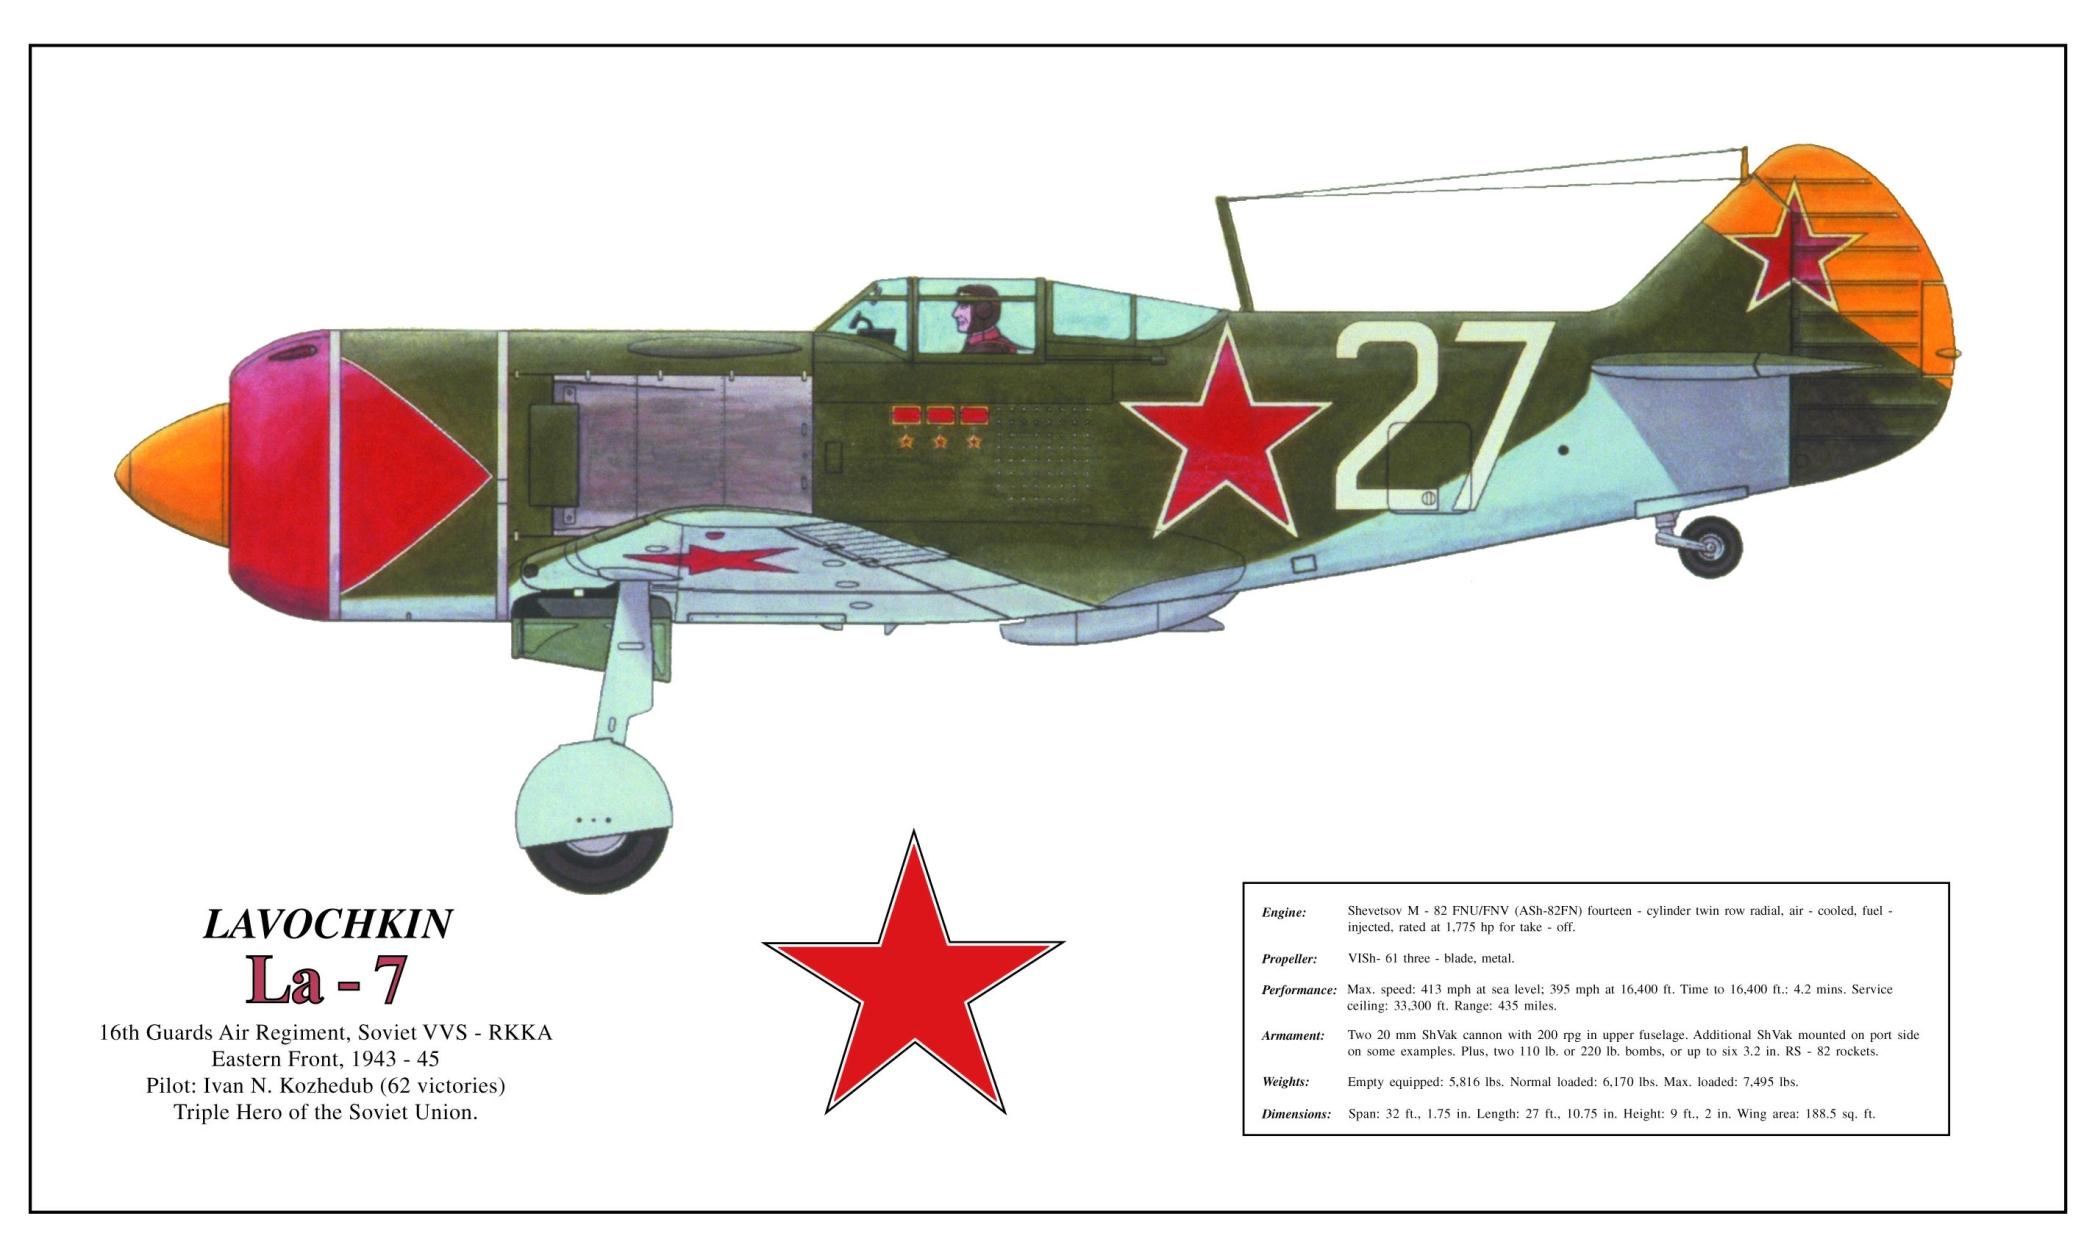 Lavochkin La-7 - World War II Aircraft: Vintage Pinup Wall